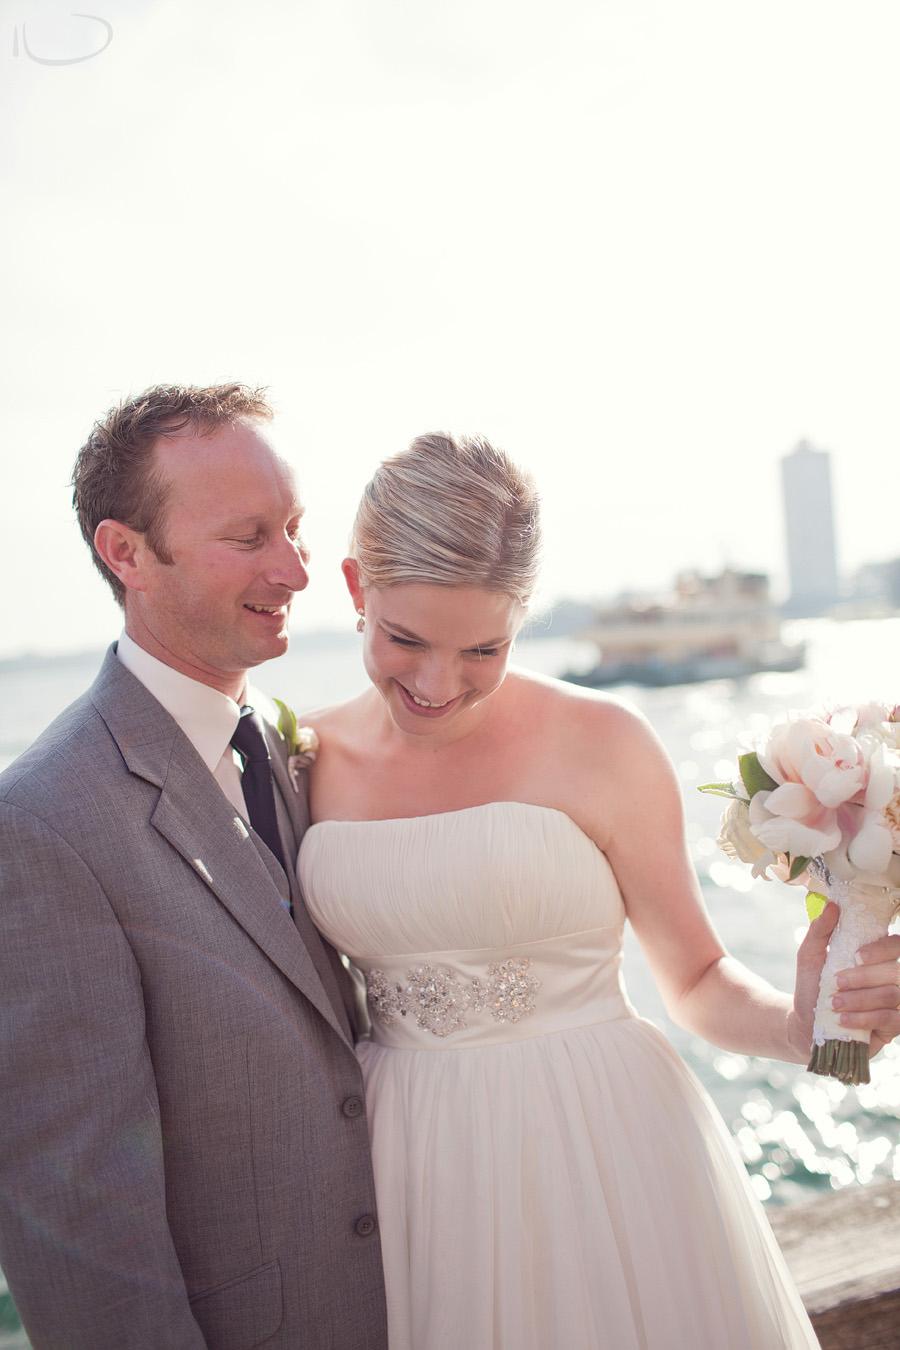 Milsons Point Wedding Photographer: Bride & Groom portrait